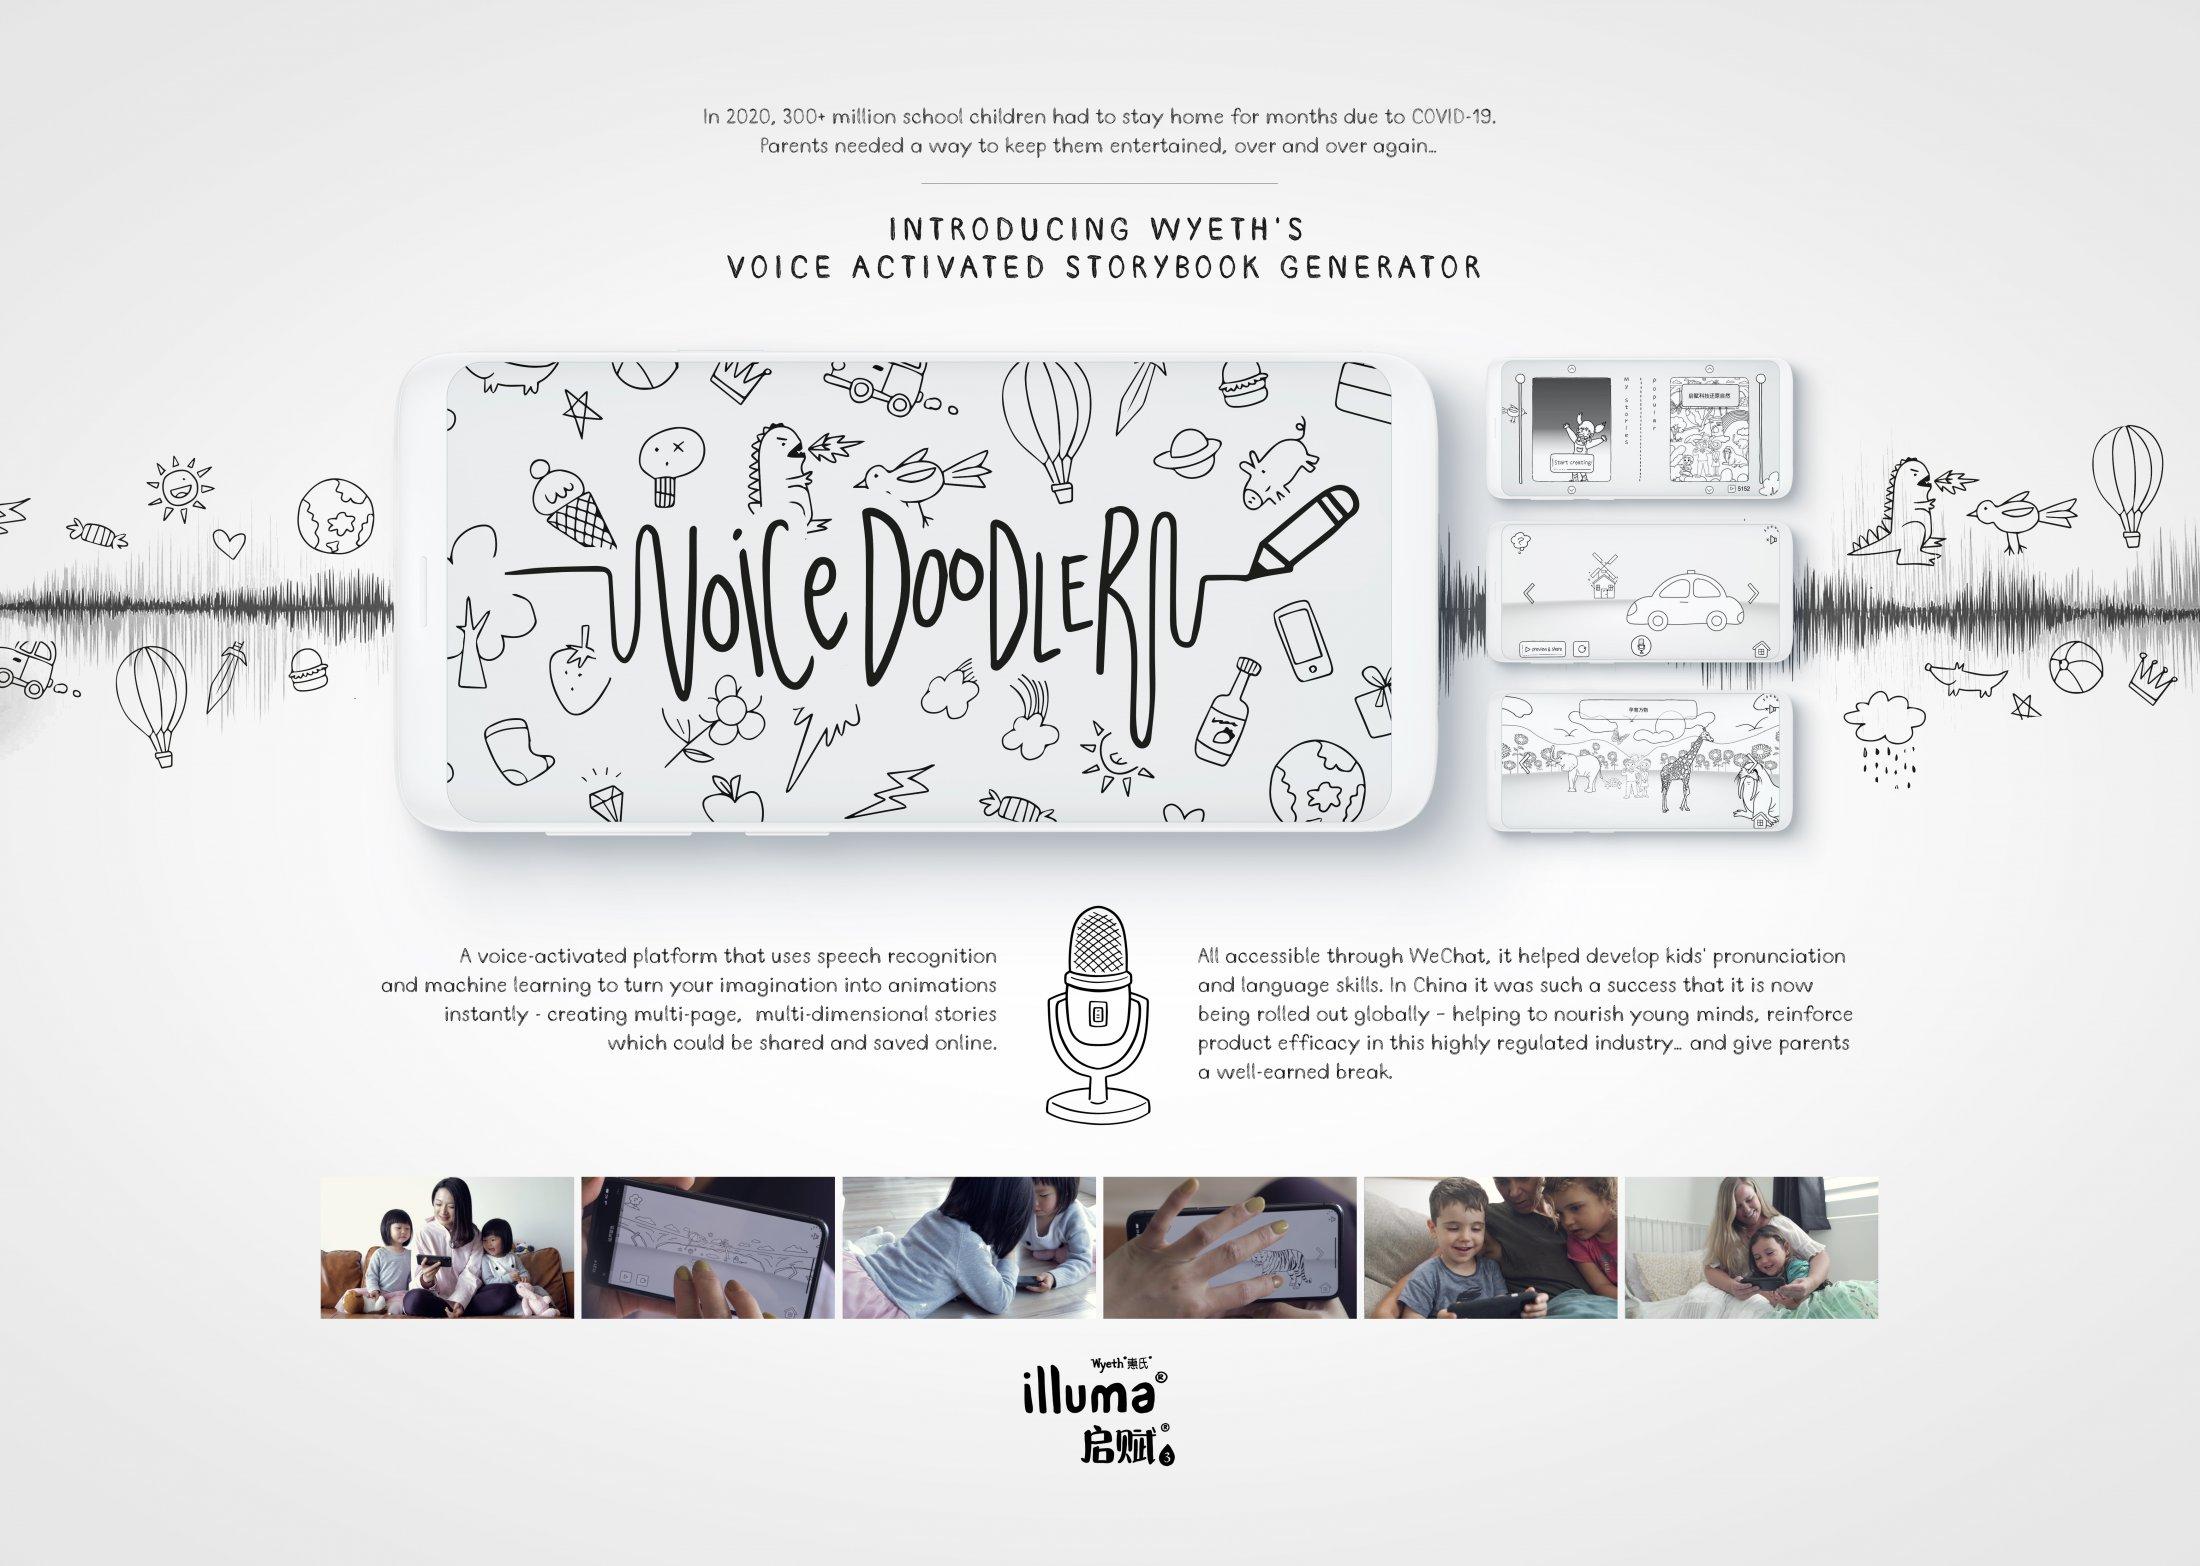 Thumbnail for Voice Doodler